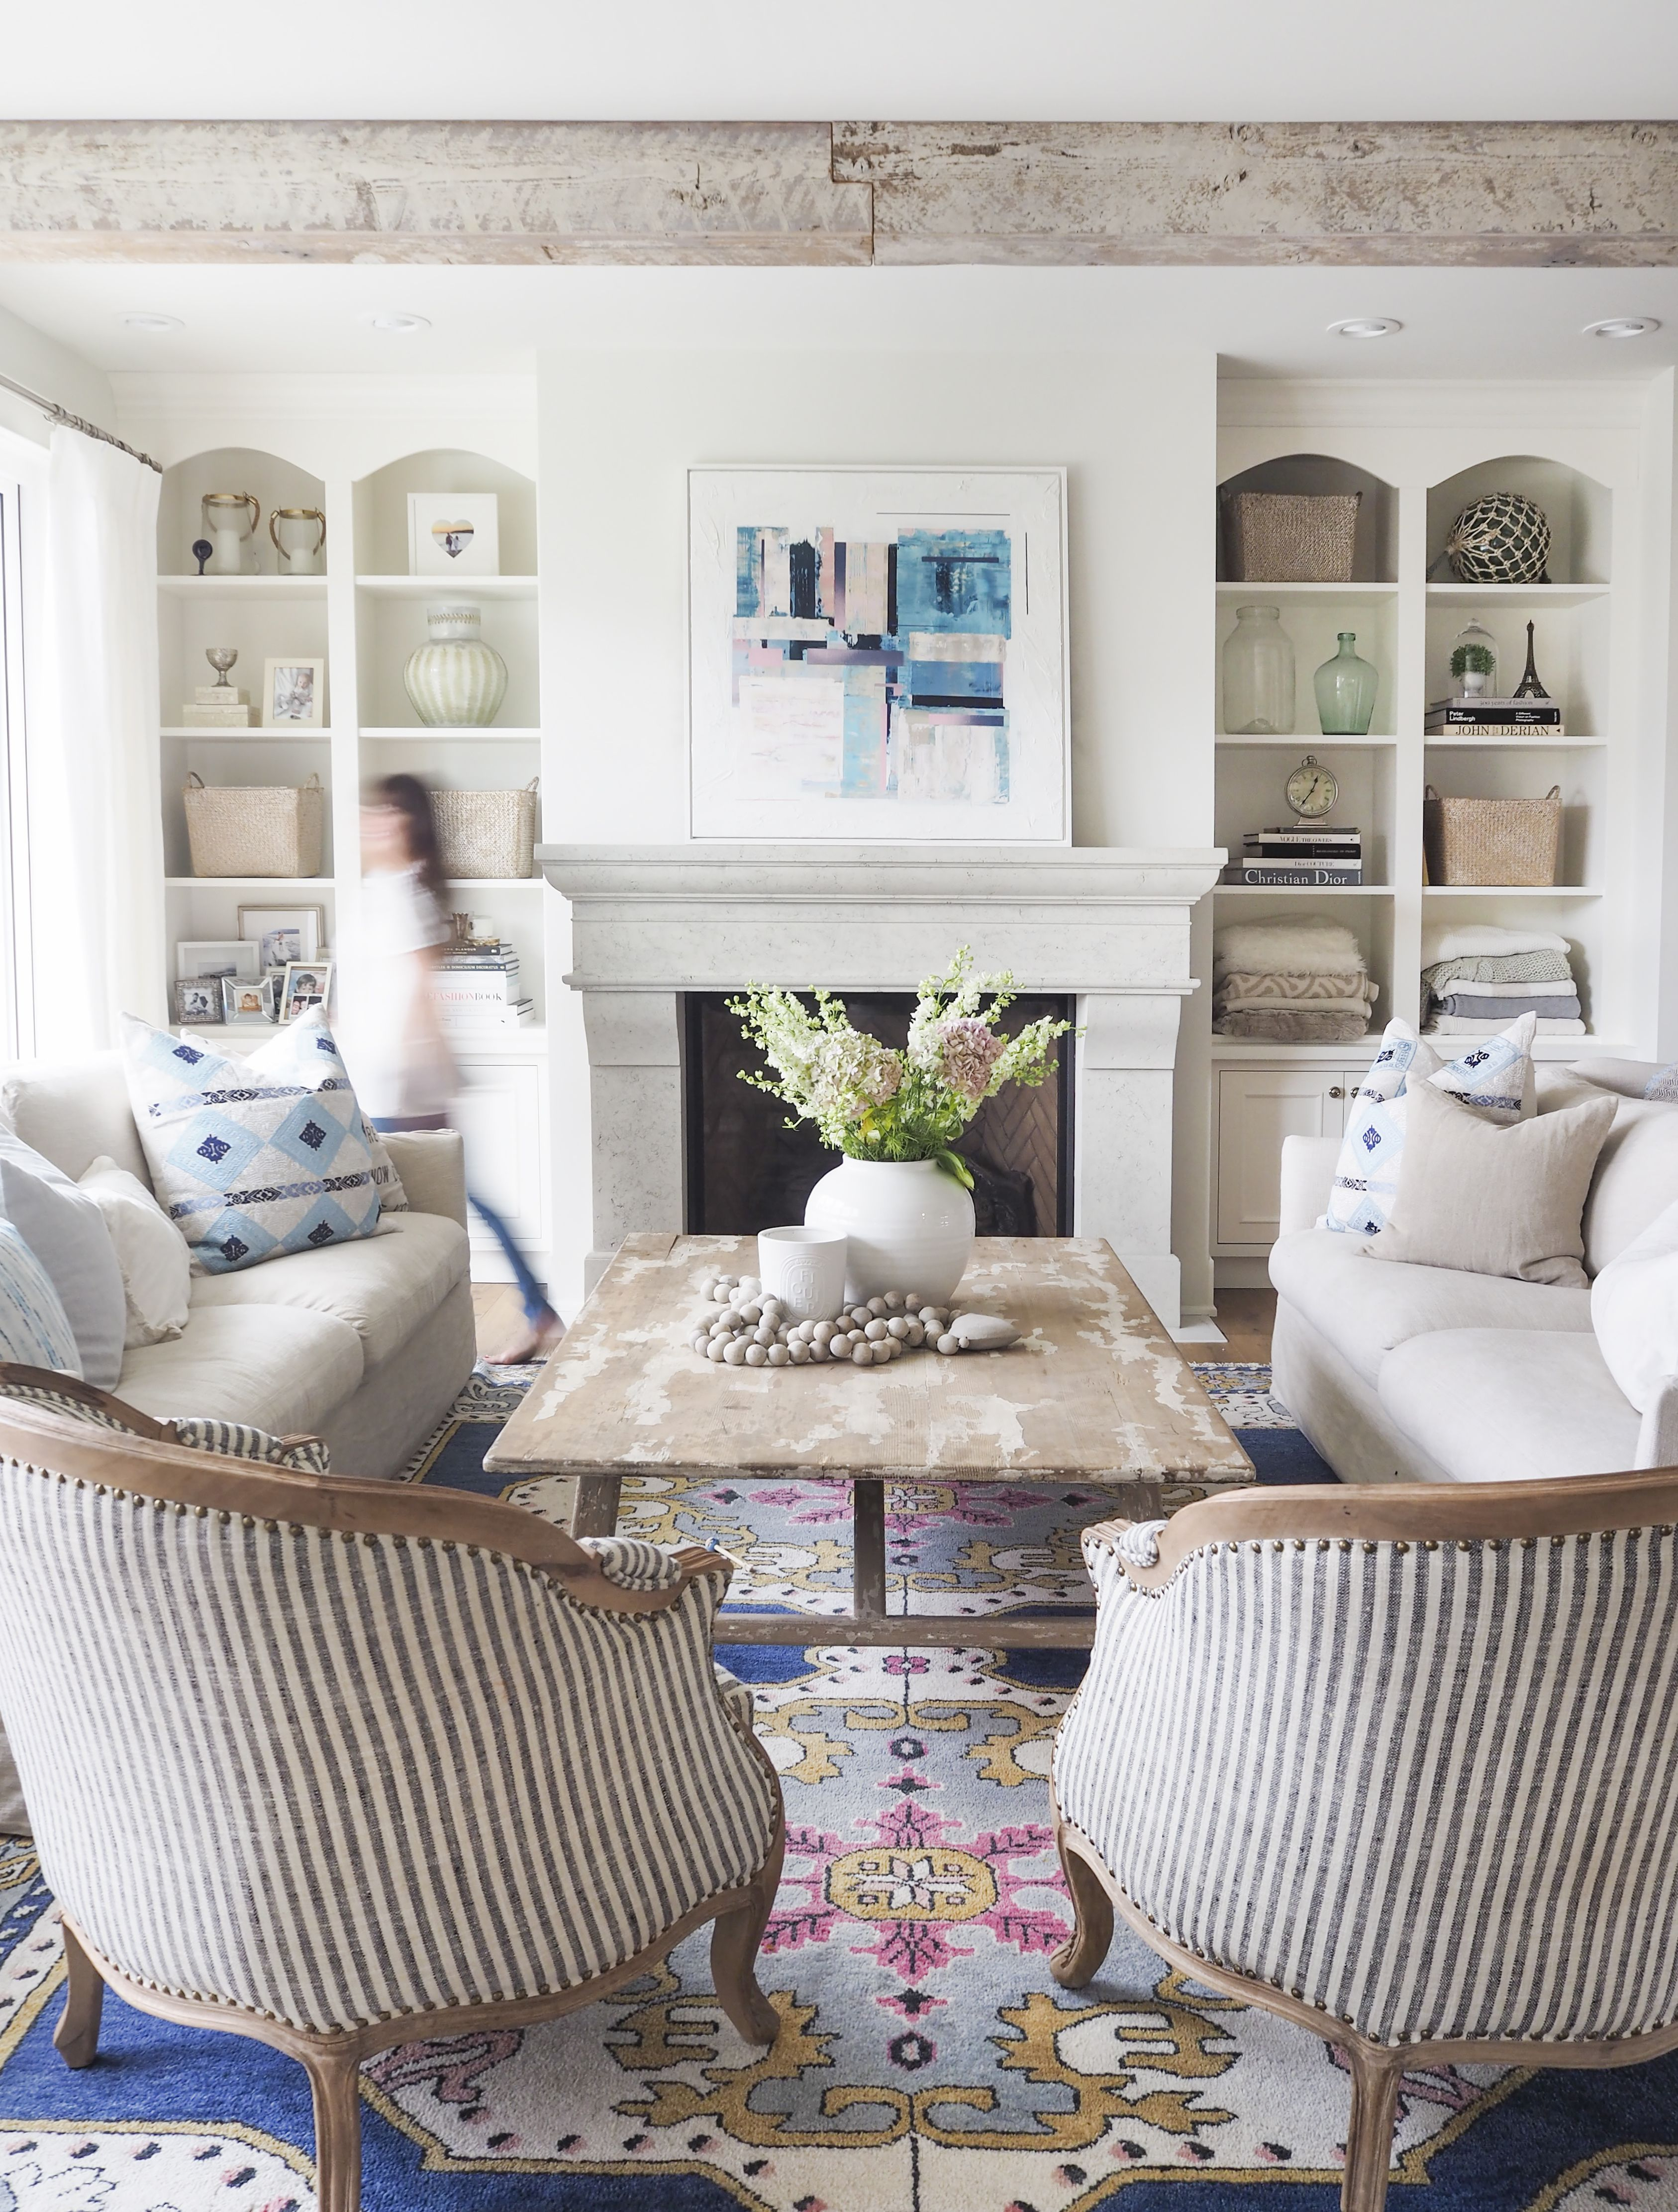 Jillianharris home design decor furniture style art painting